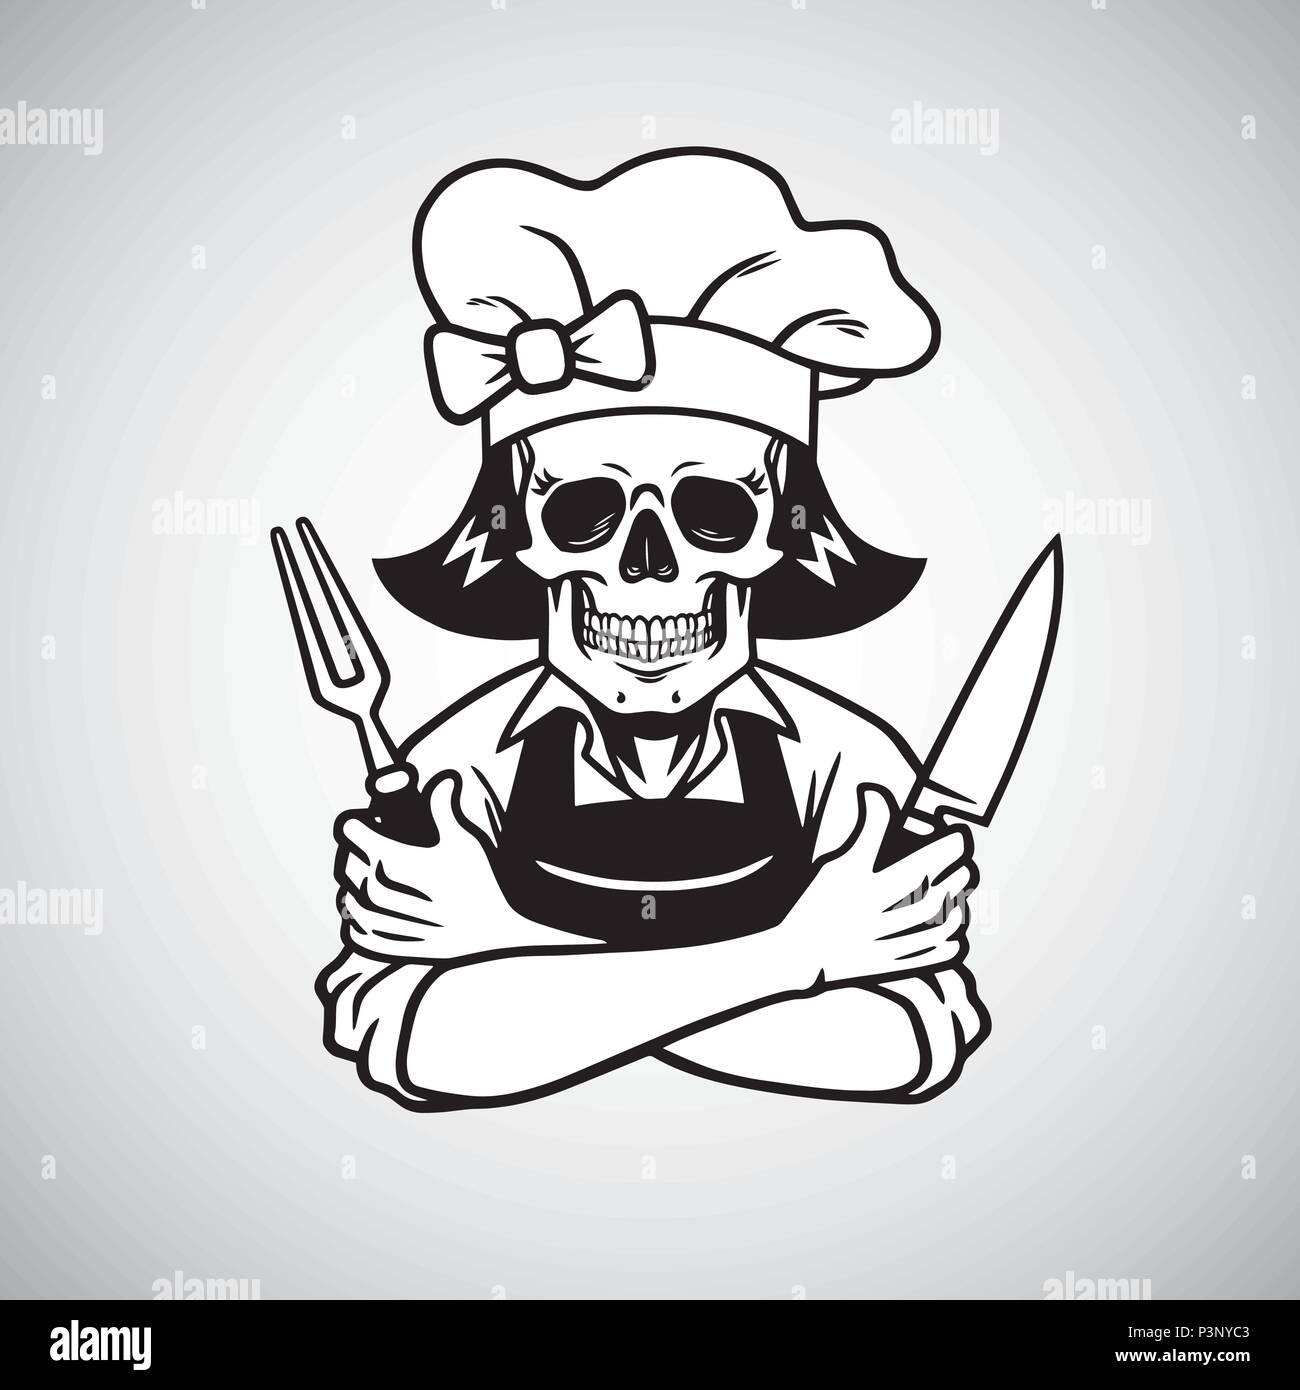 chef logo stock photos chef logo stock images alamy